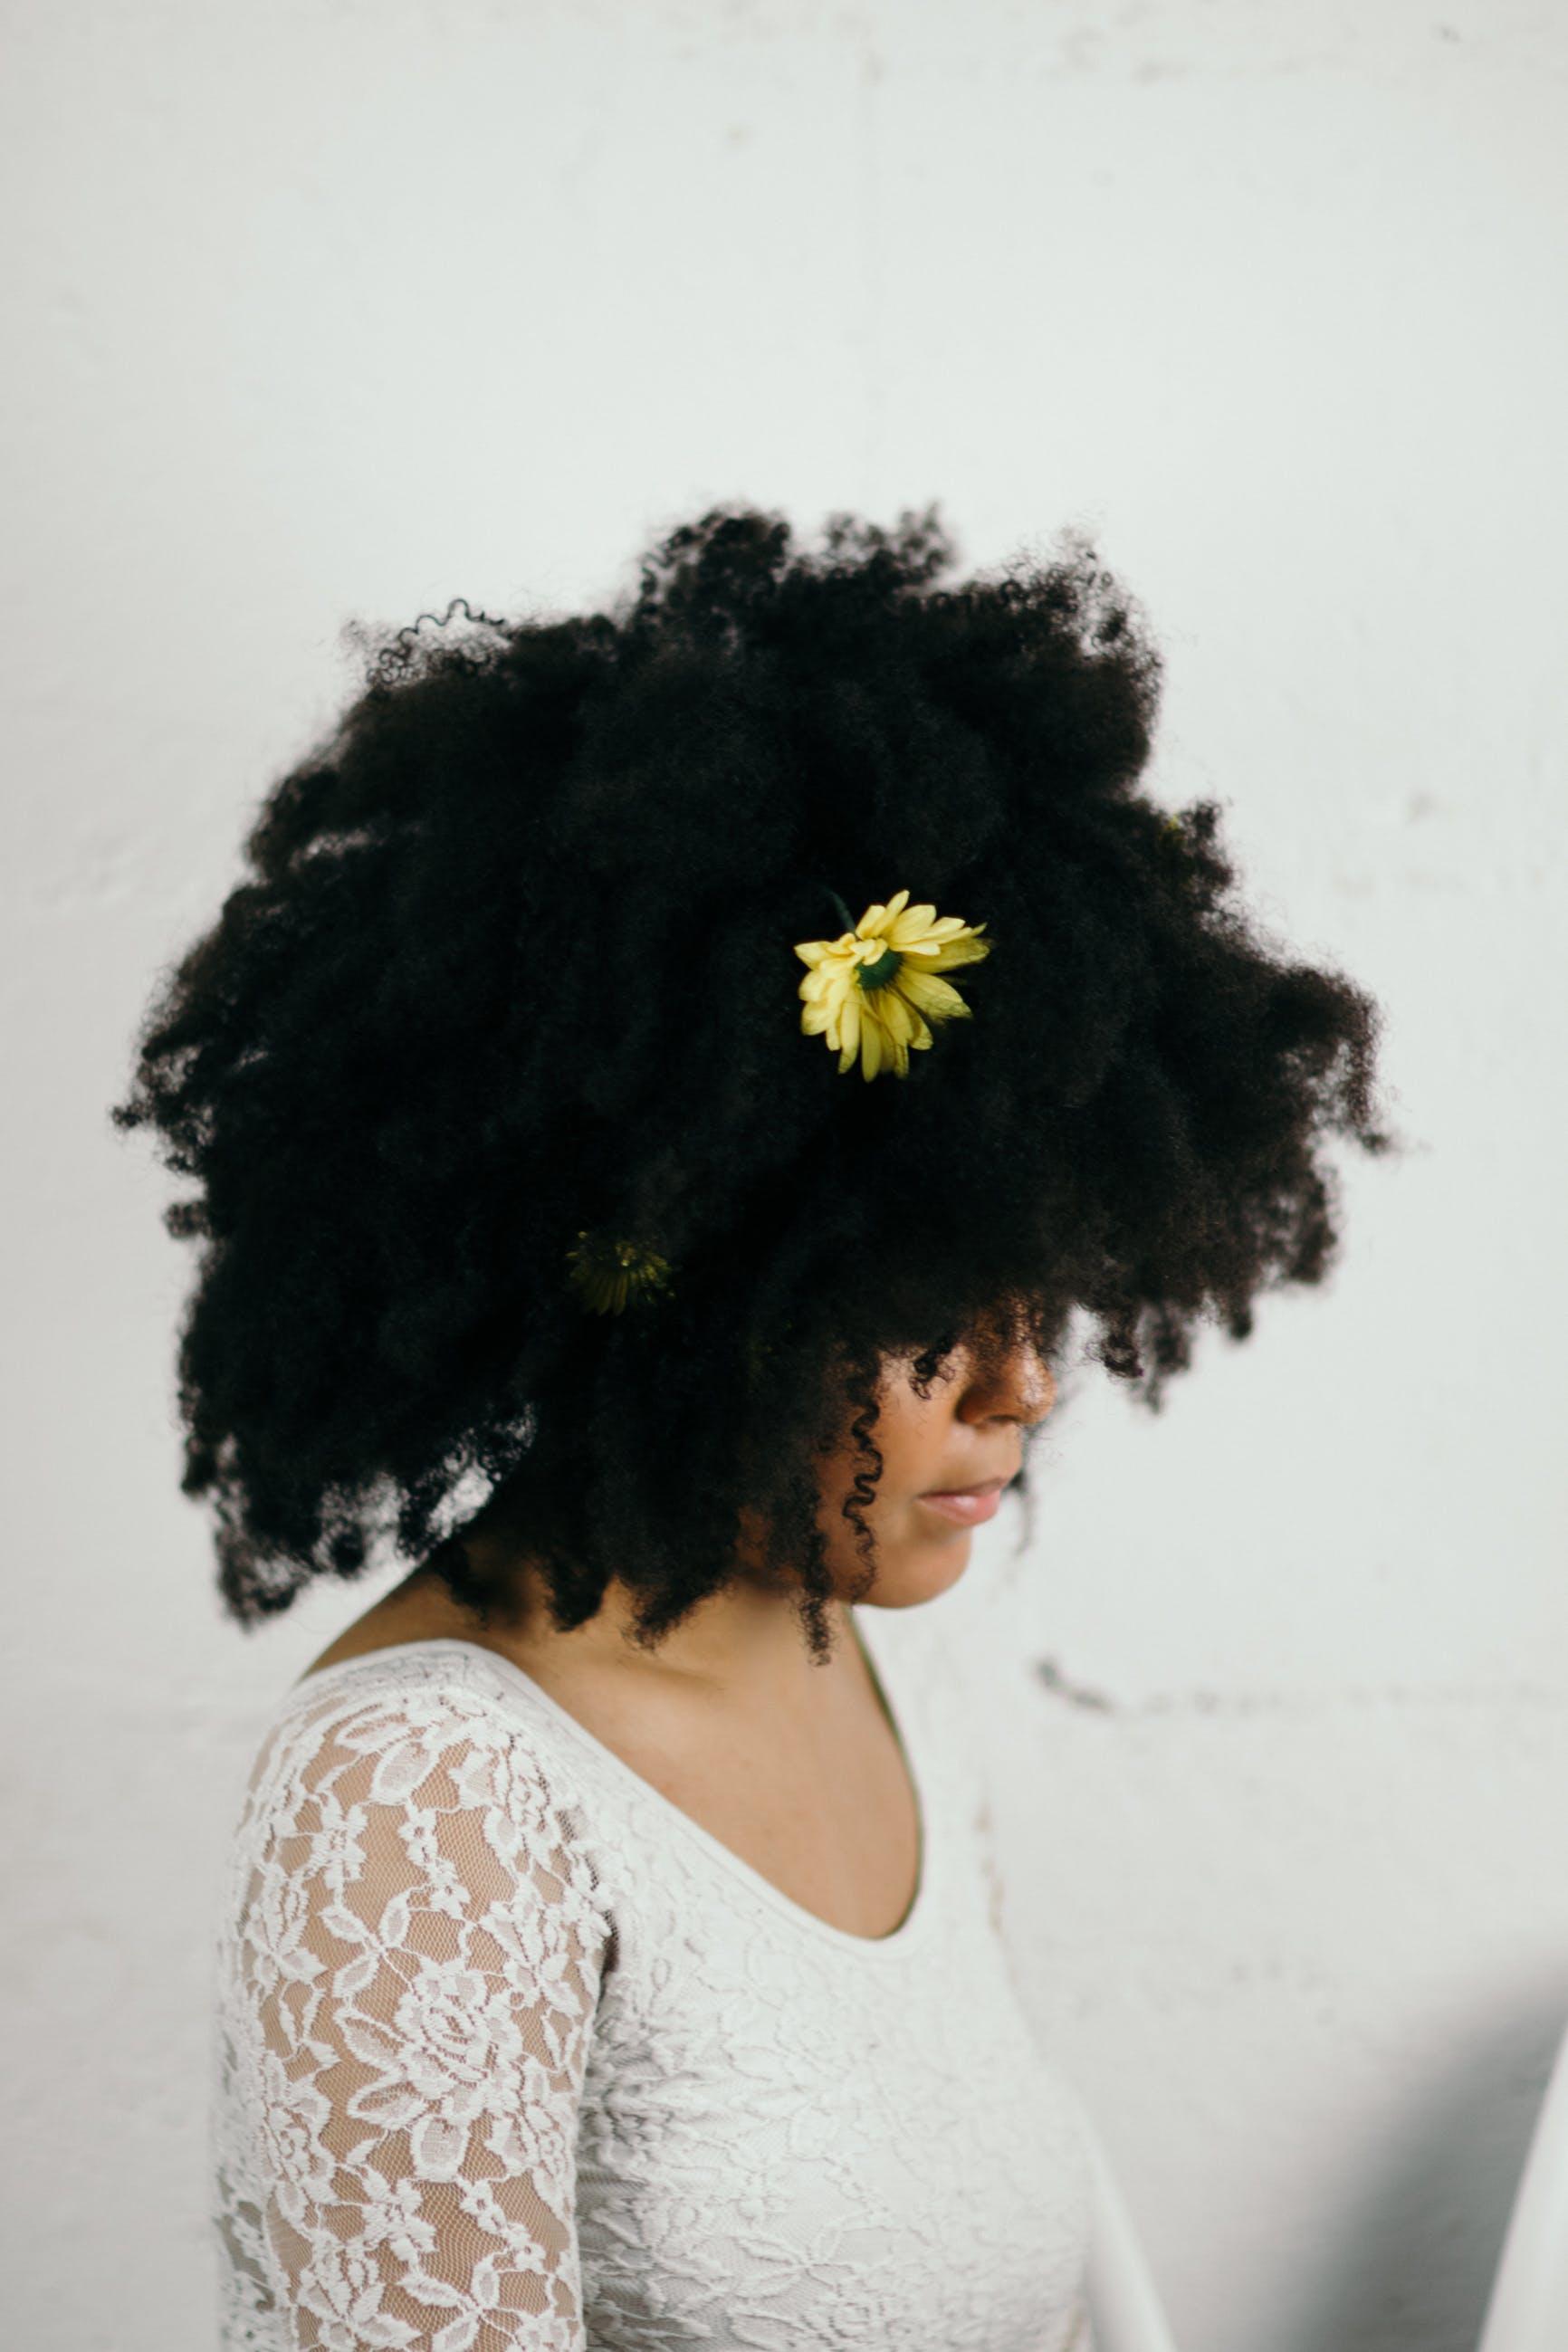 afro, ansigtsudtryk, blomst